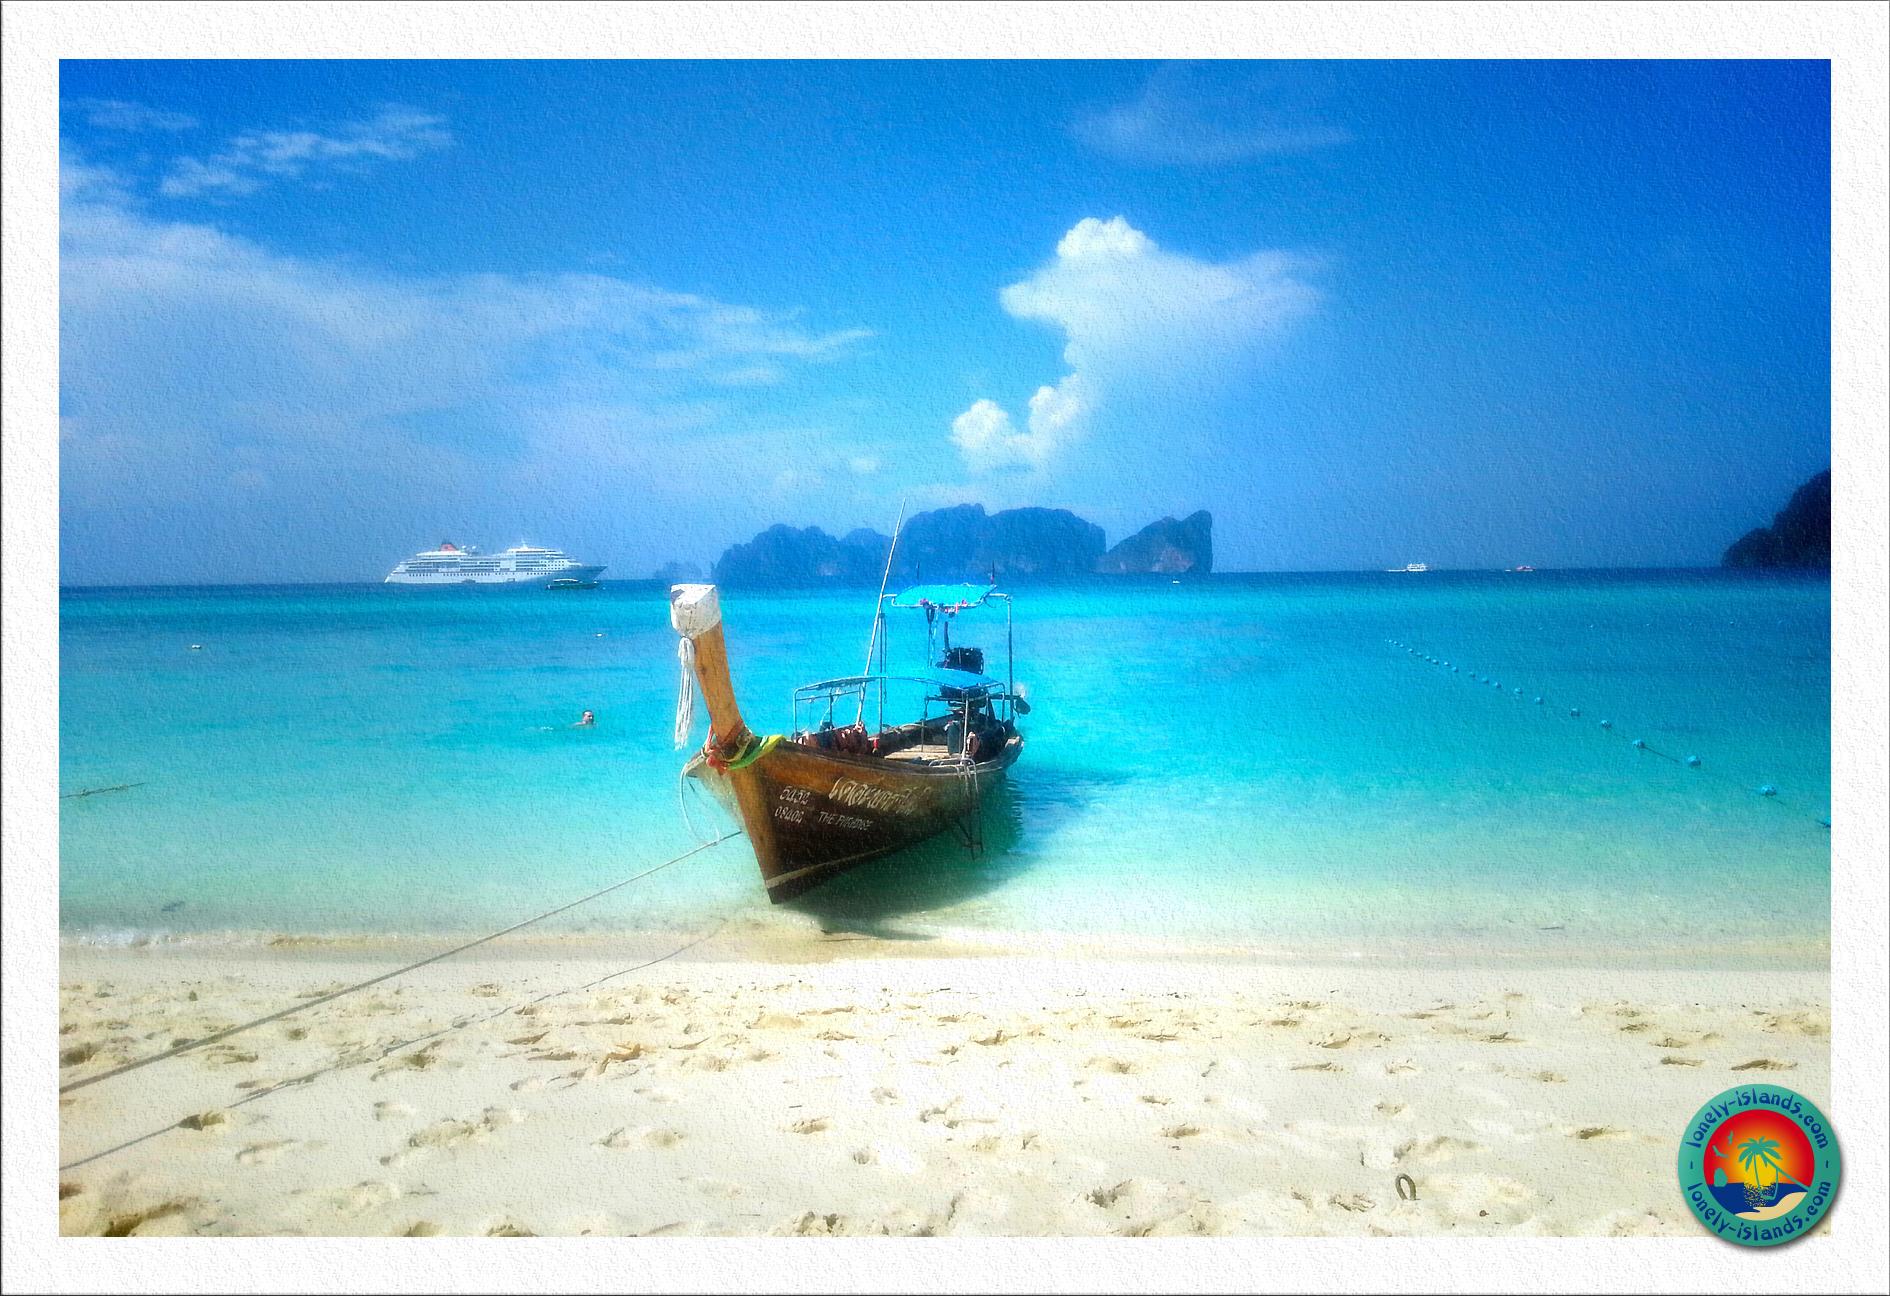 Traumhafter Longbeach mit Blick auf Phi Phi Leh